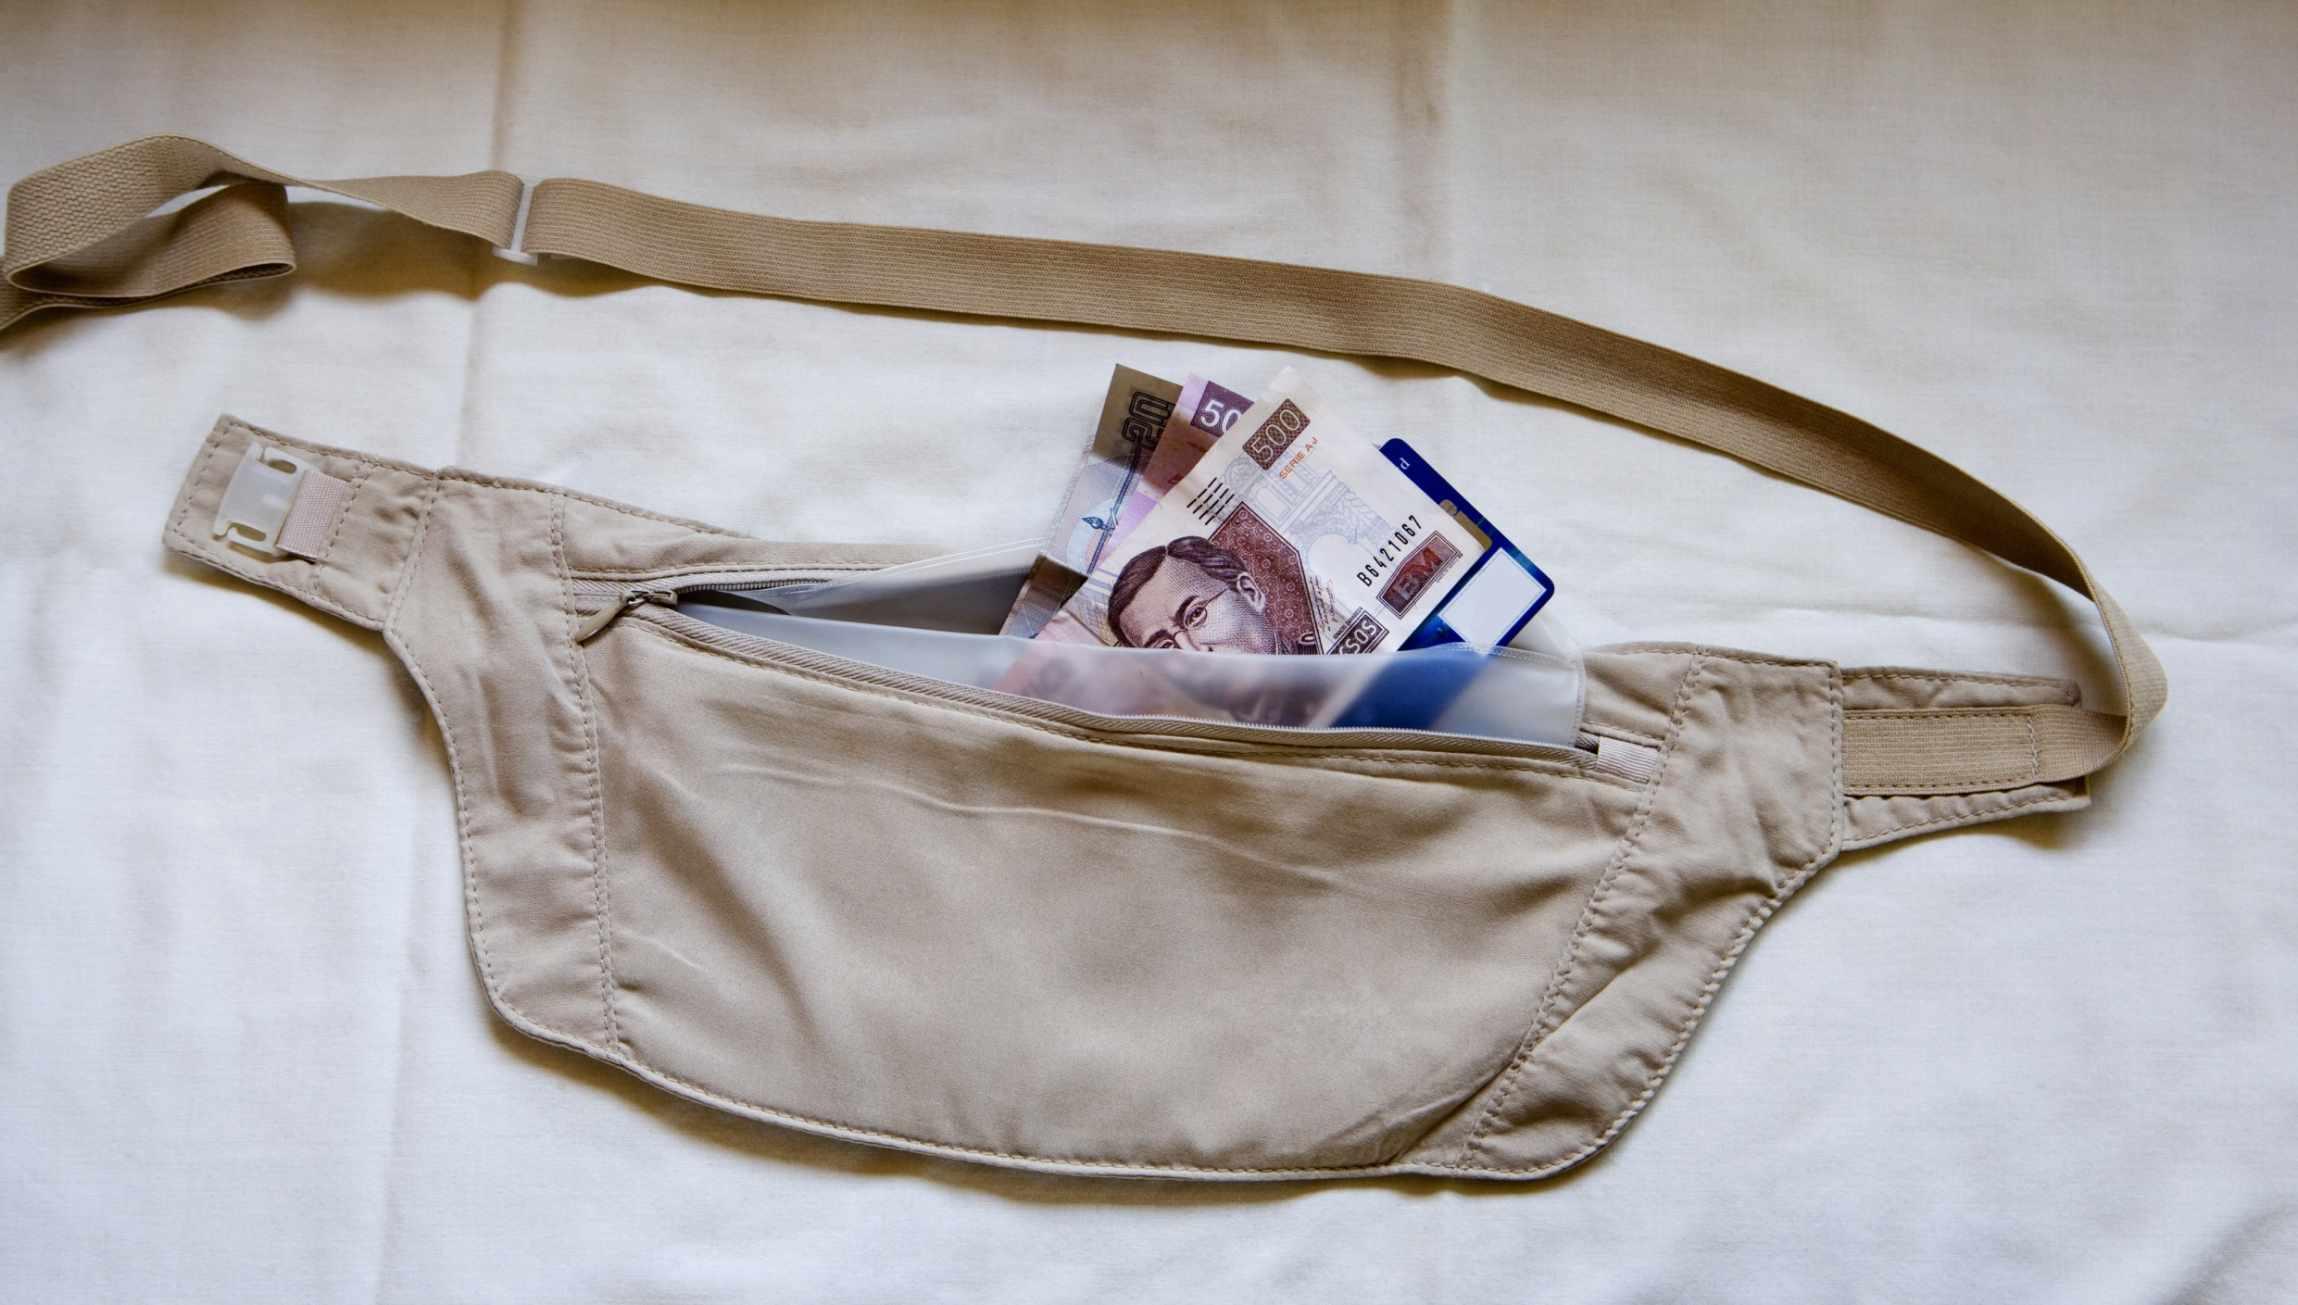 Money belt open on bed